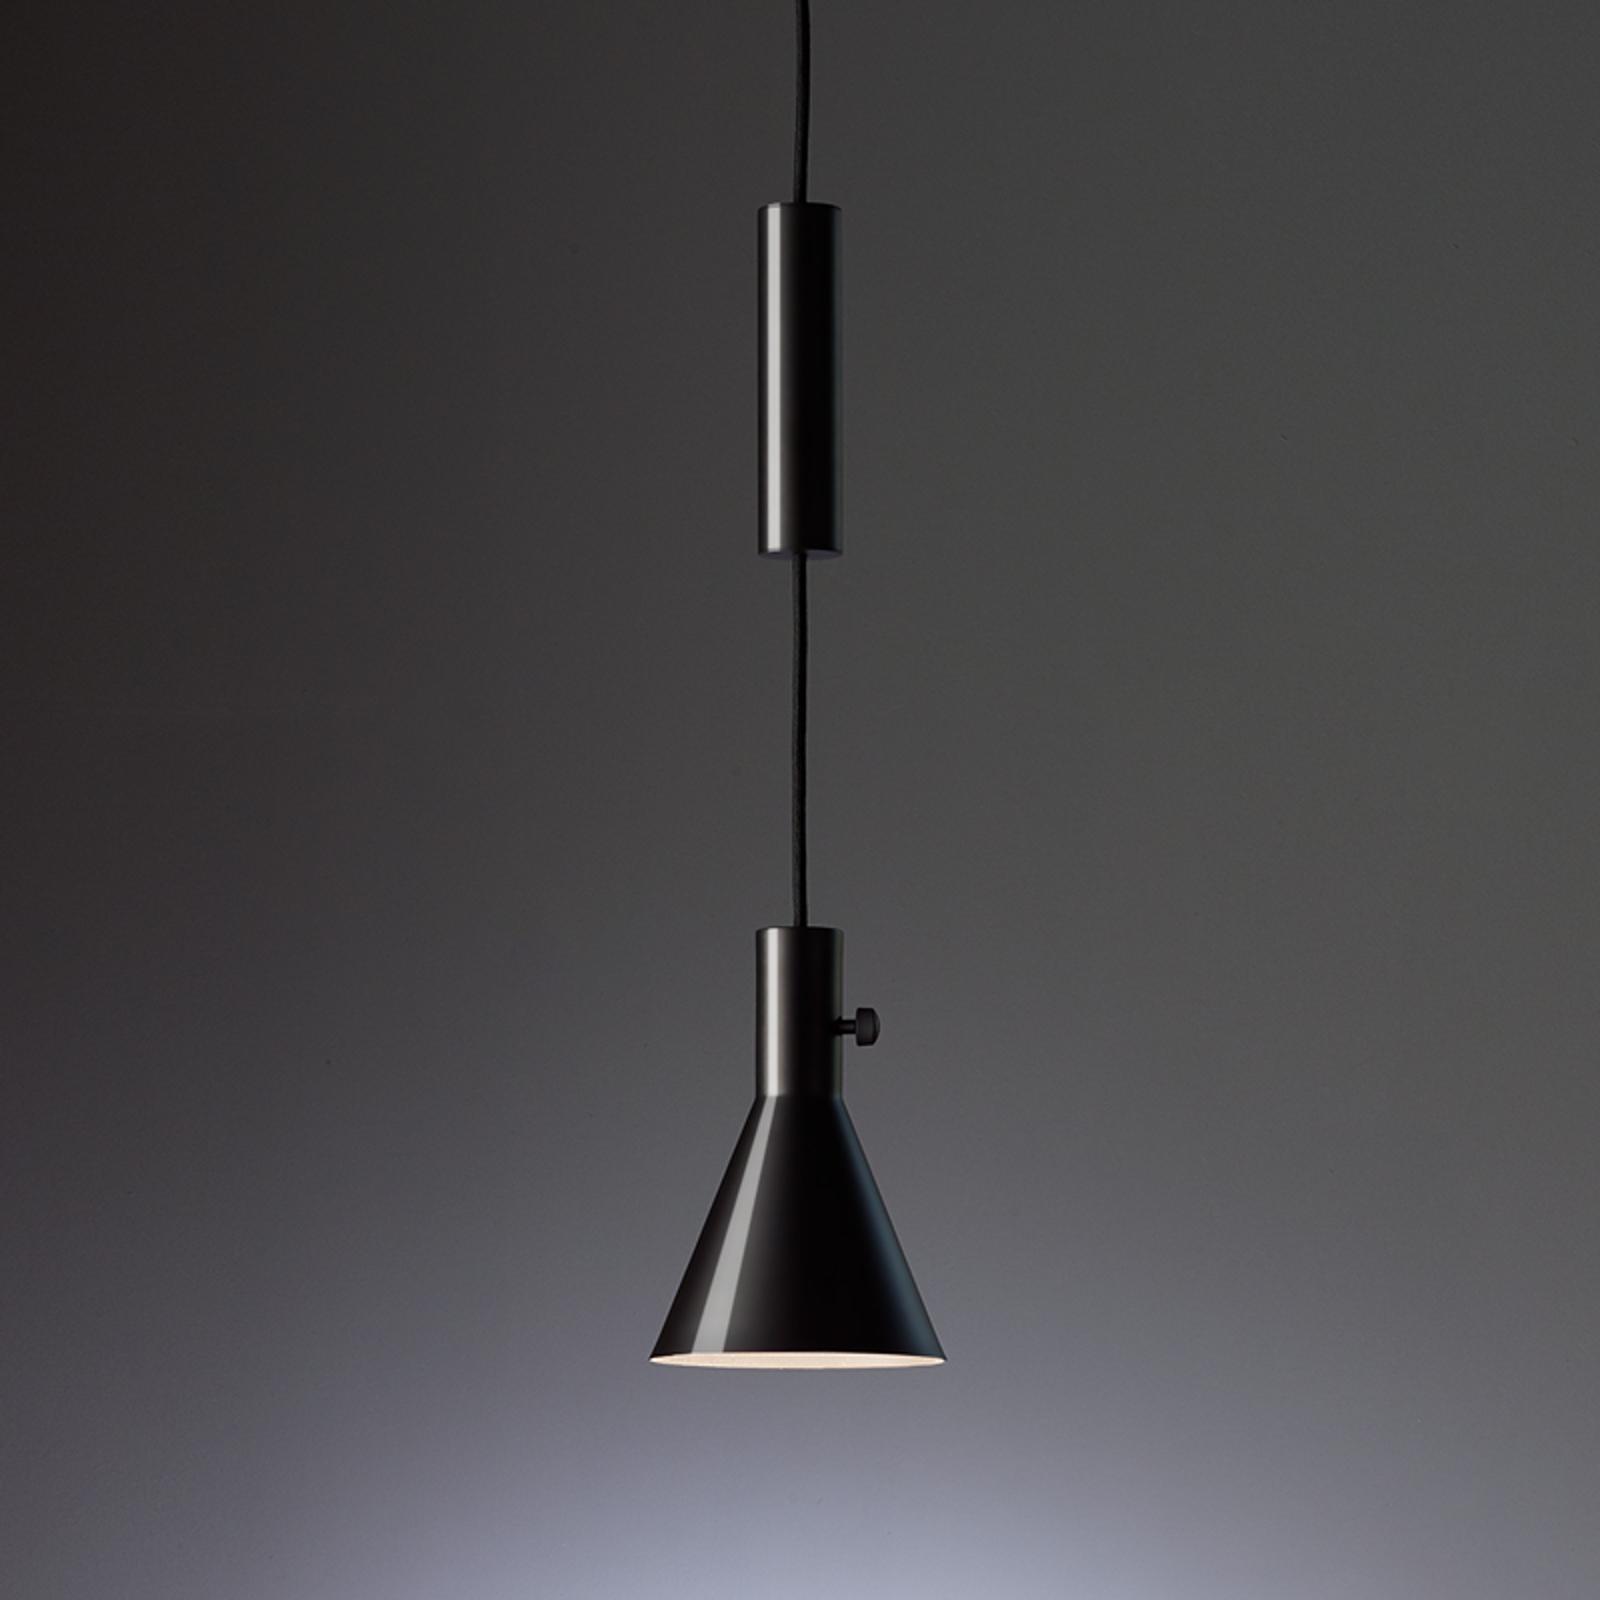 TECNOLUMEN Eleu - LED-Pendelleuchte, schwarz glanz